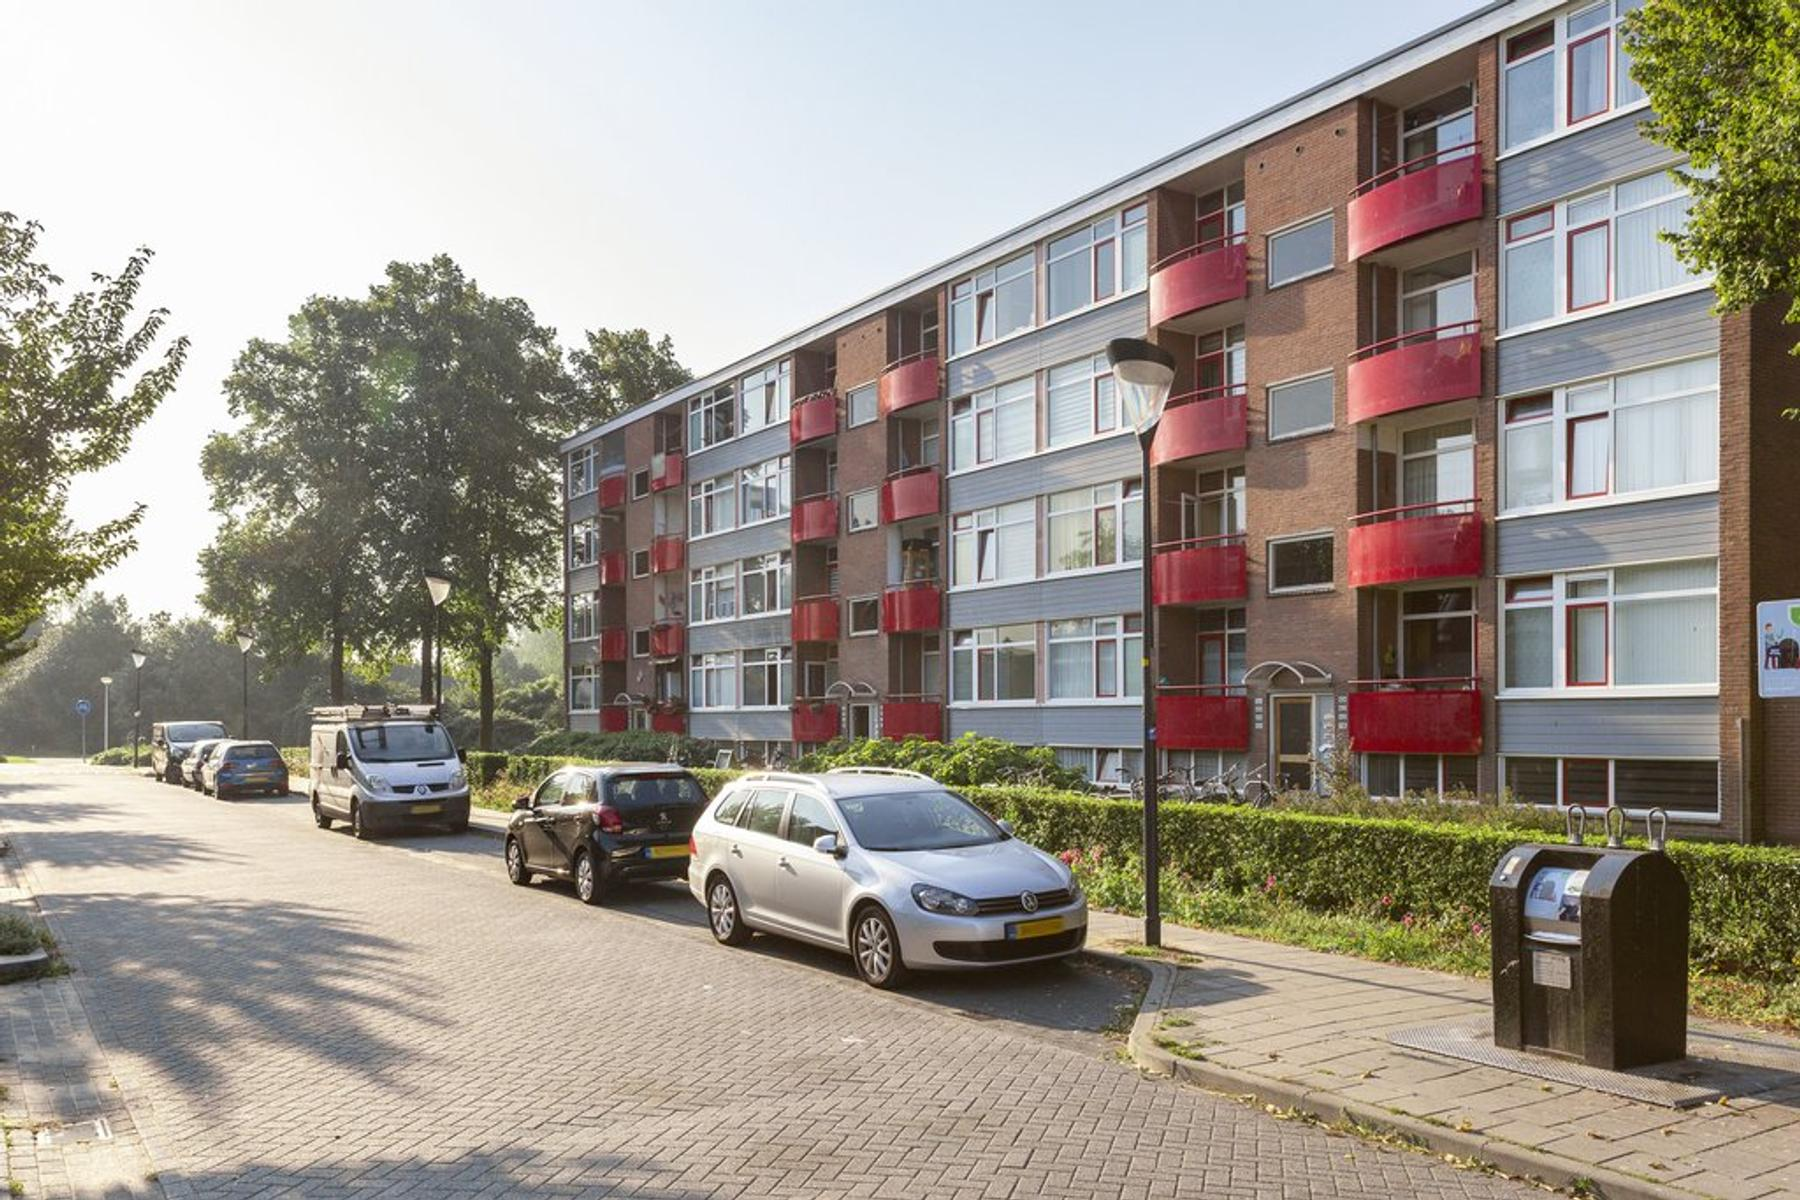 Maasstraat 428 in Deventer 7417 AX